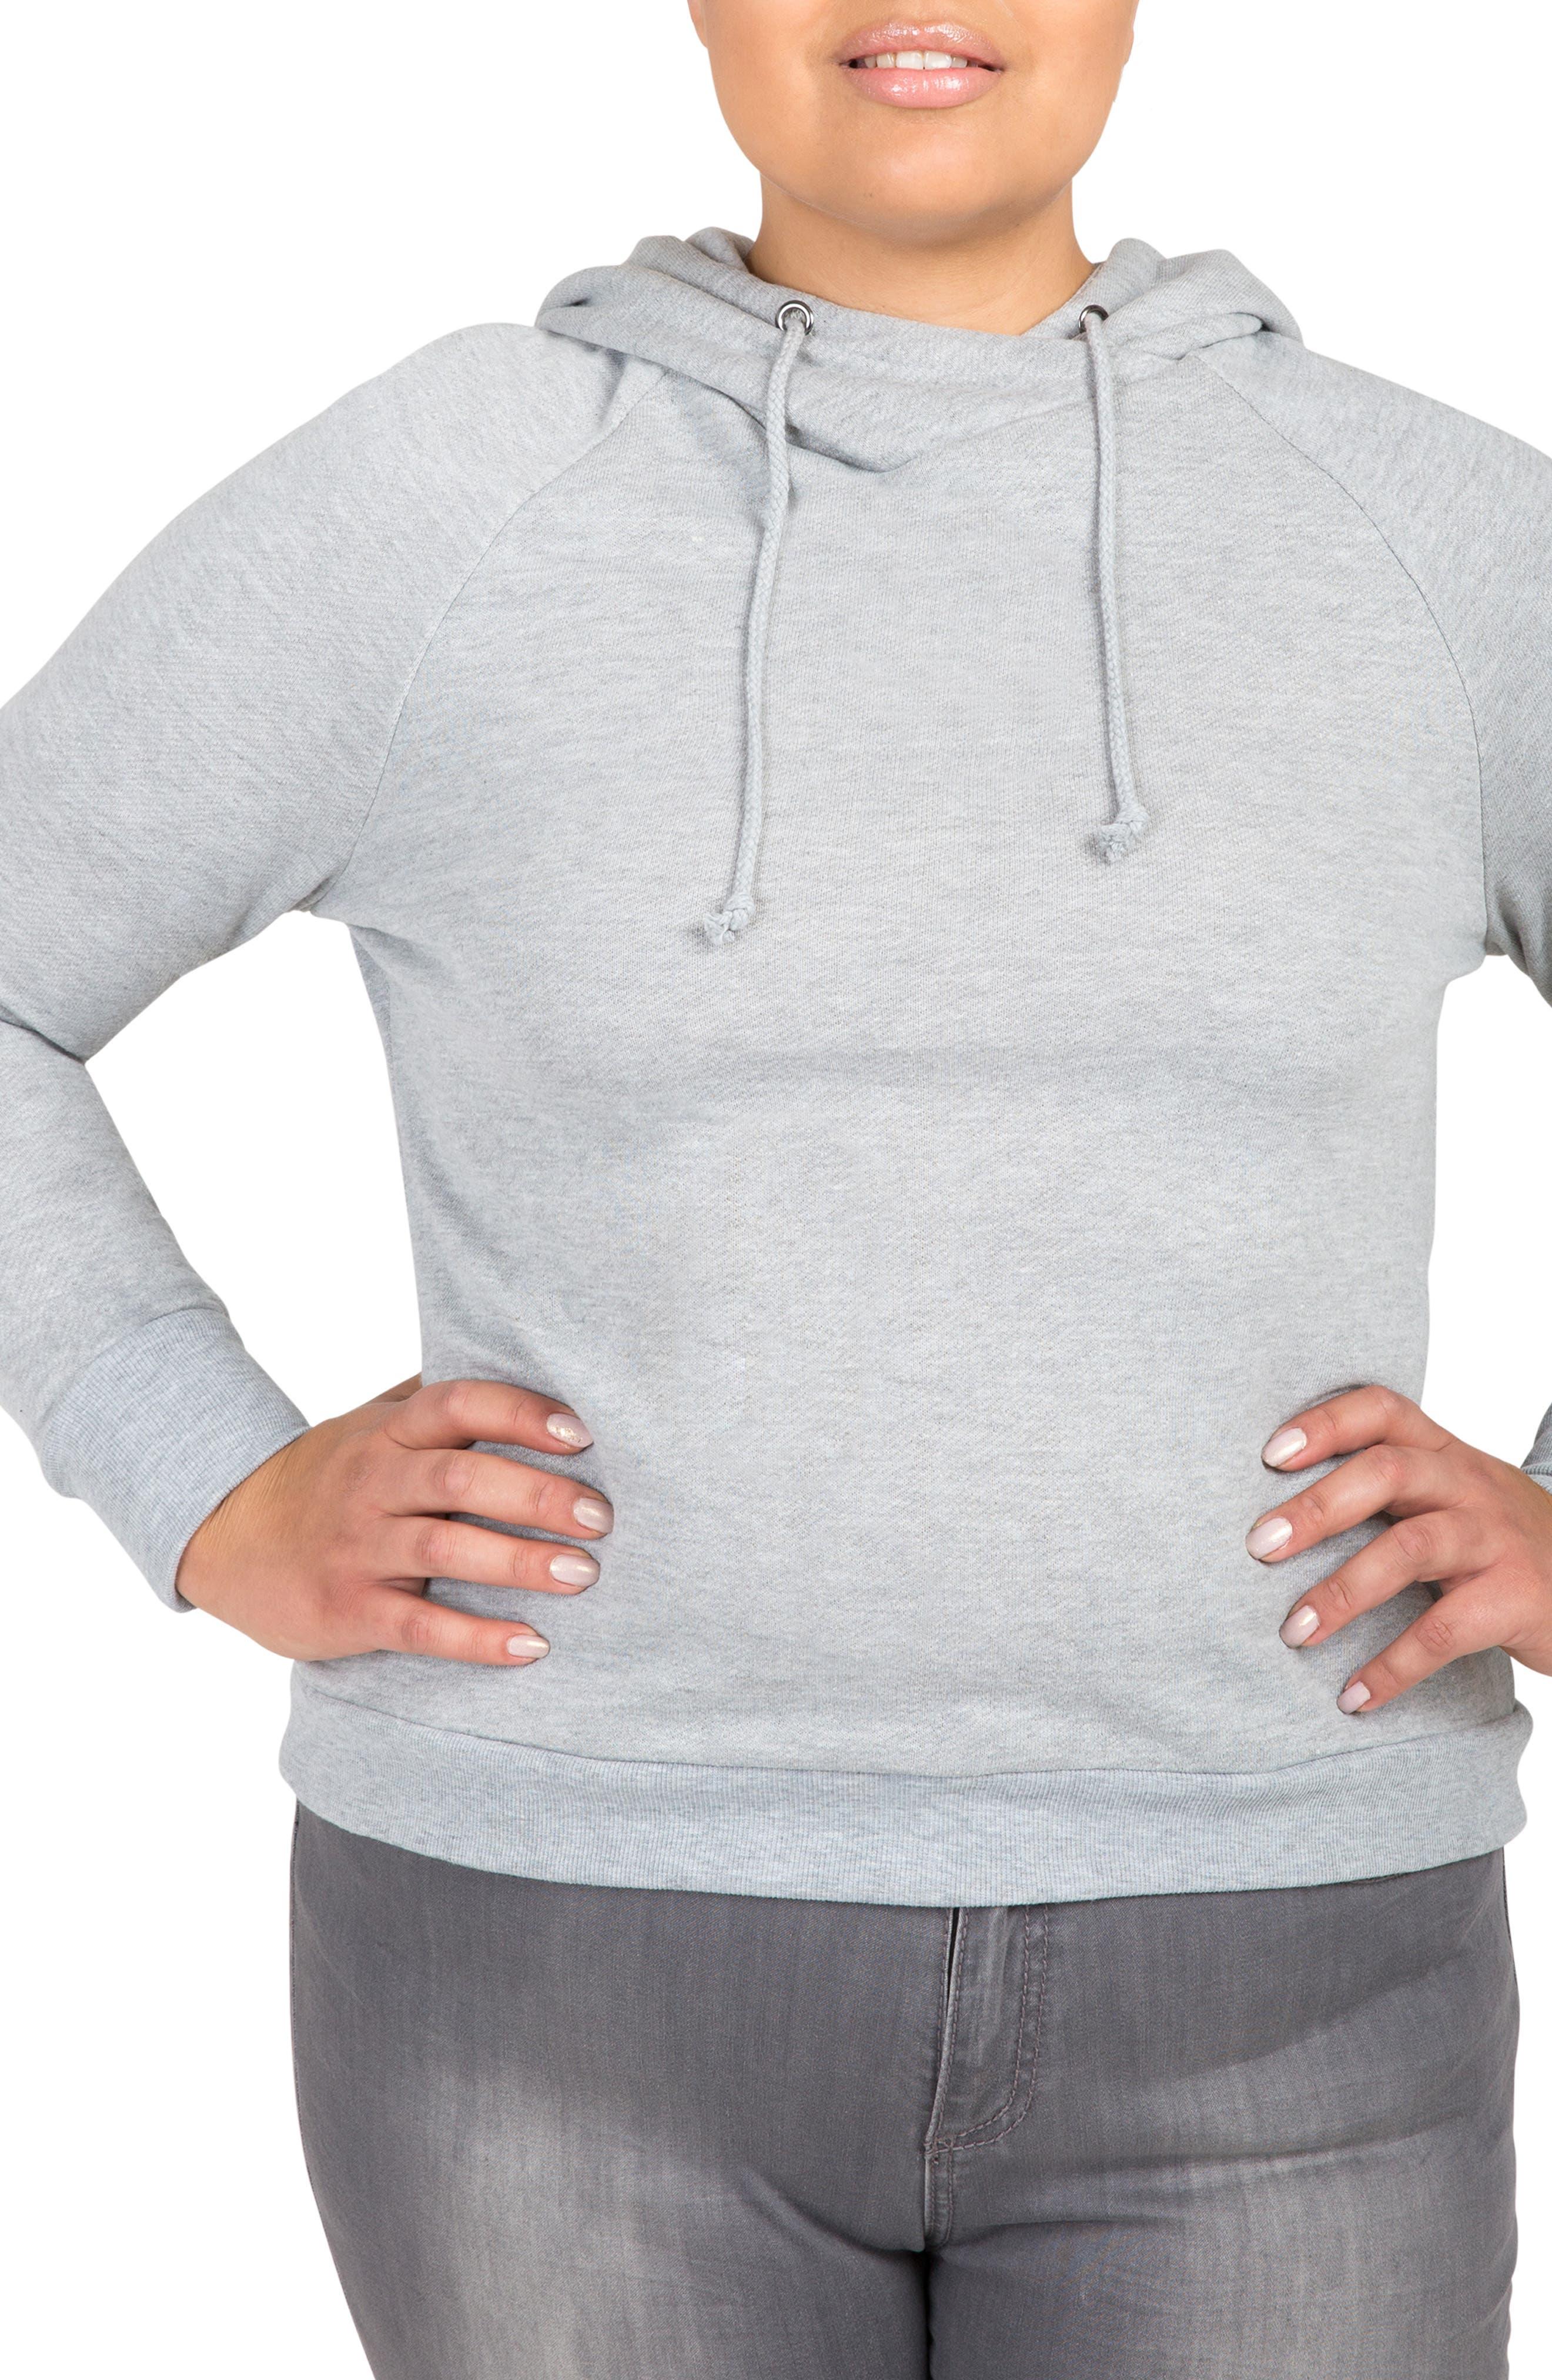 Back Cutout Hooded Sweatshirt,                             Main thumbnail 1, color,                             GREY